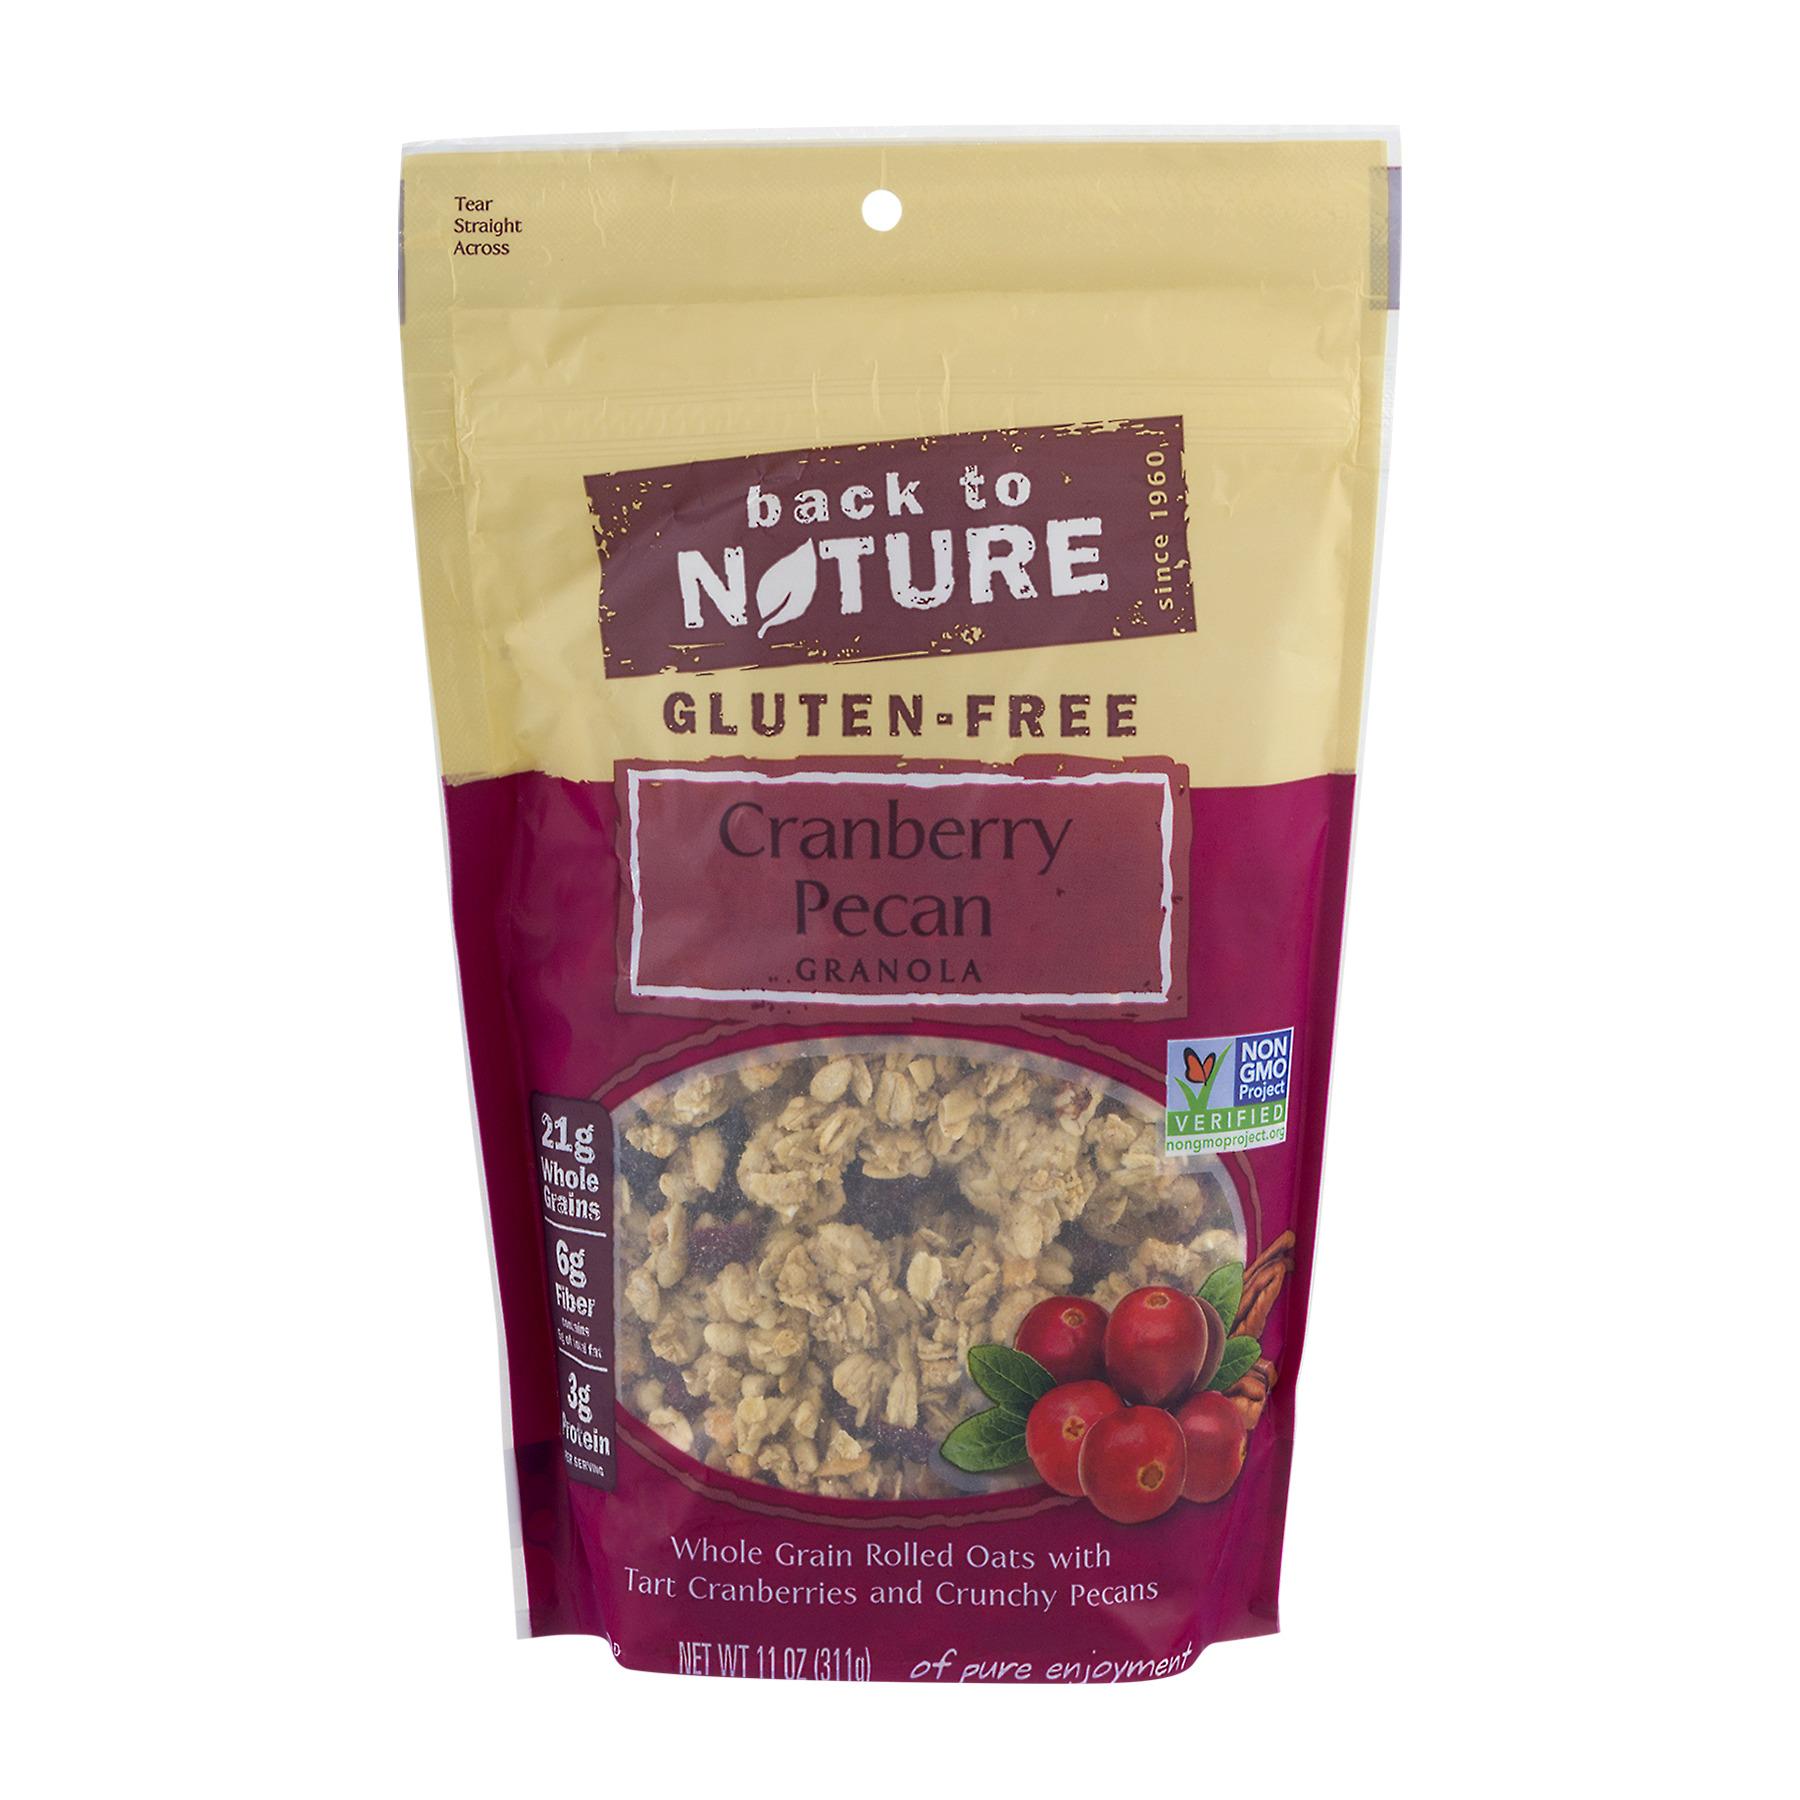 Back To Nature Gluten-Free Cranberry Pecan Granola, 11.0 OZ